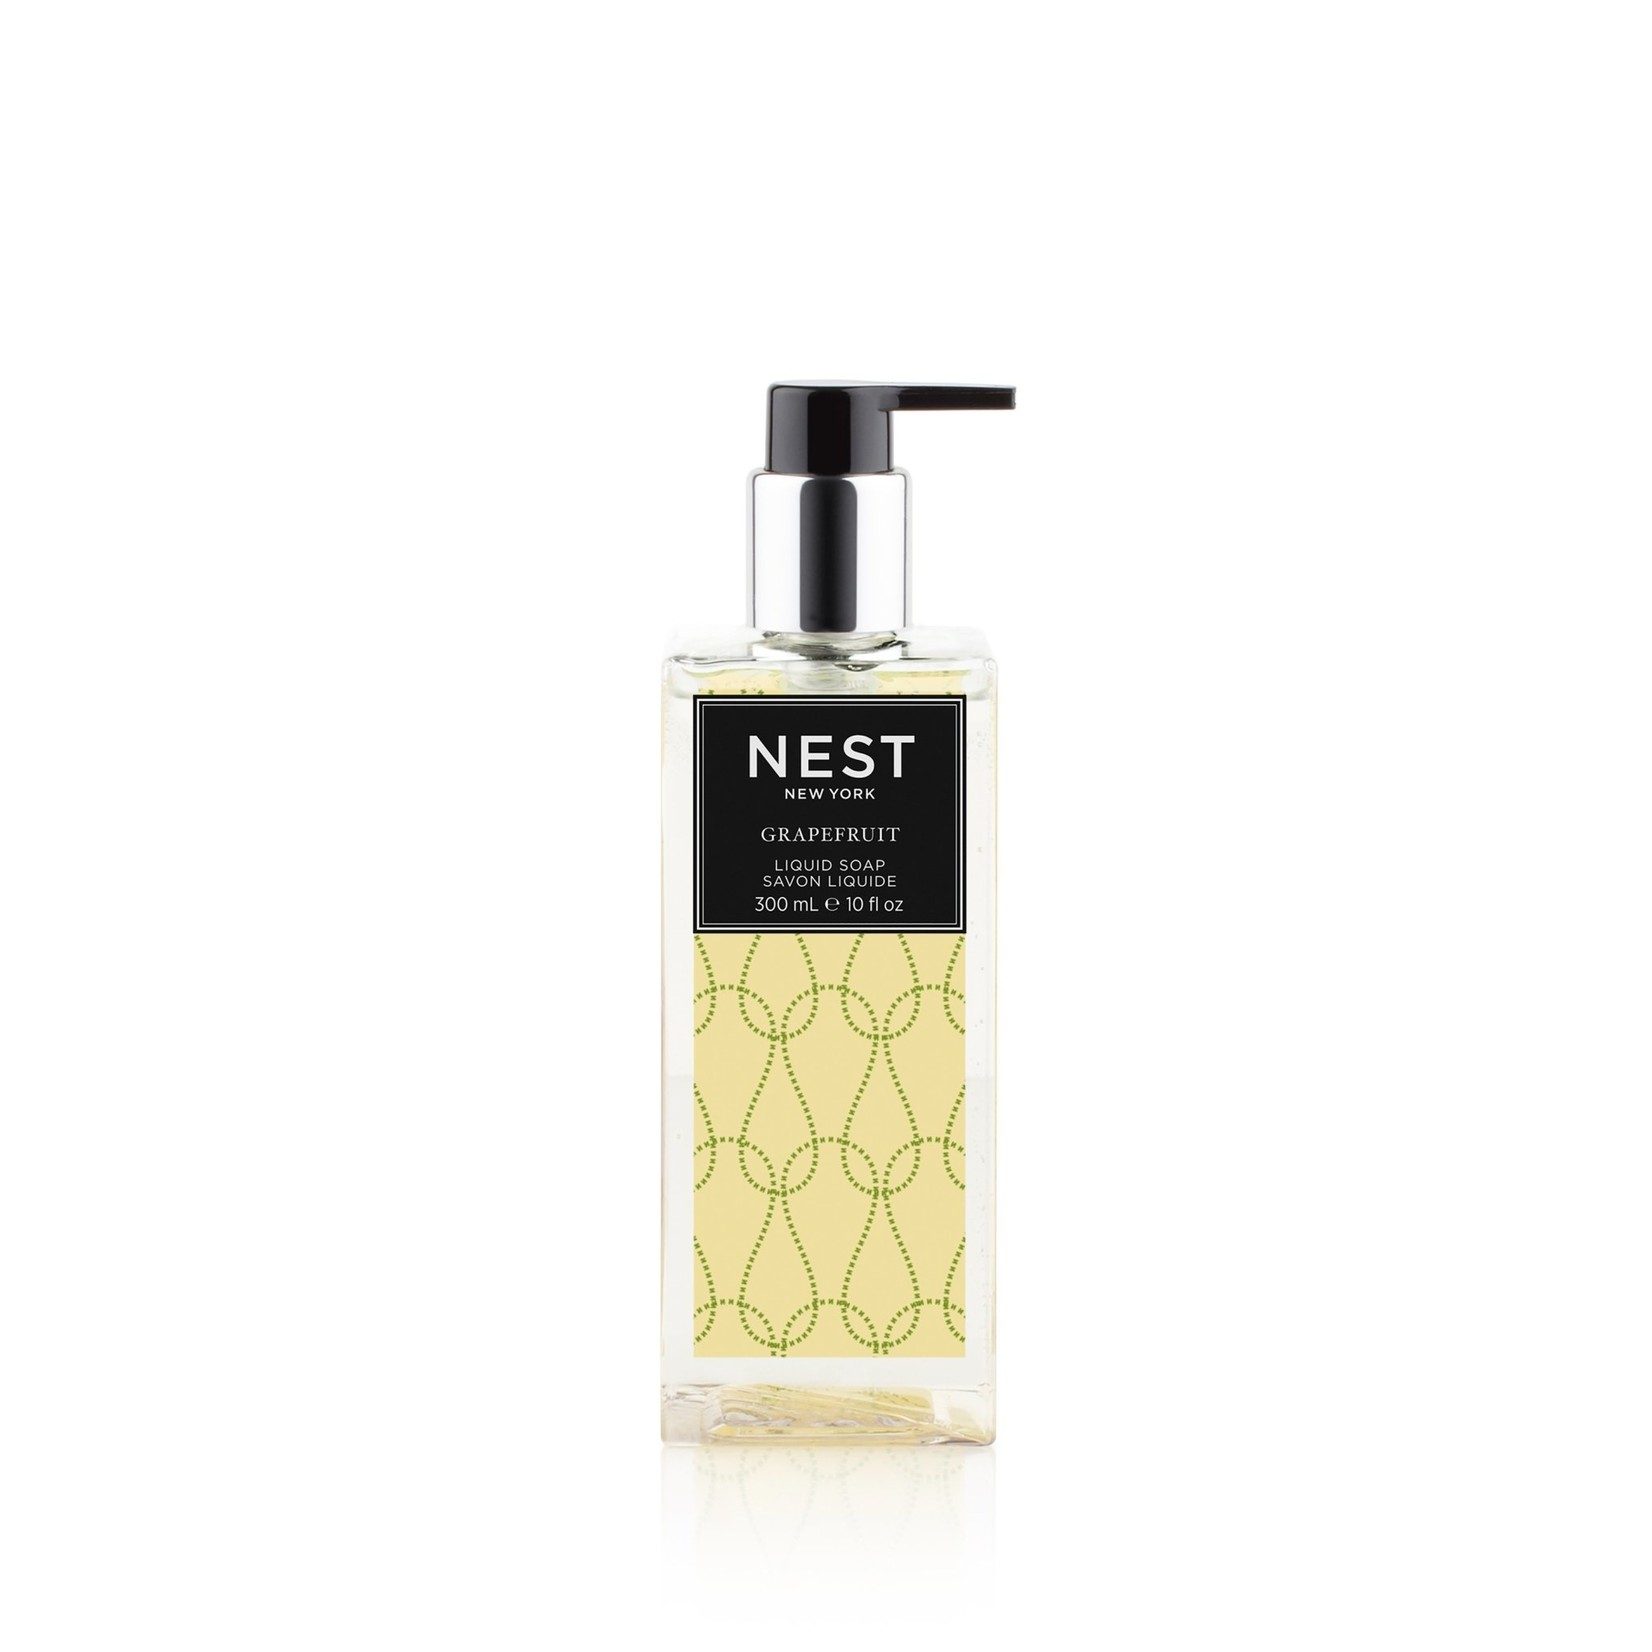 NEST NEW YORK Grapefruit Liquid Soap